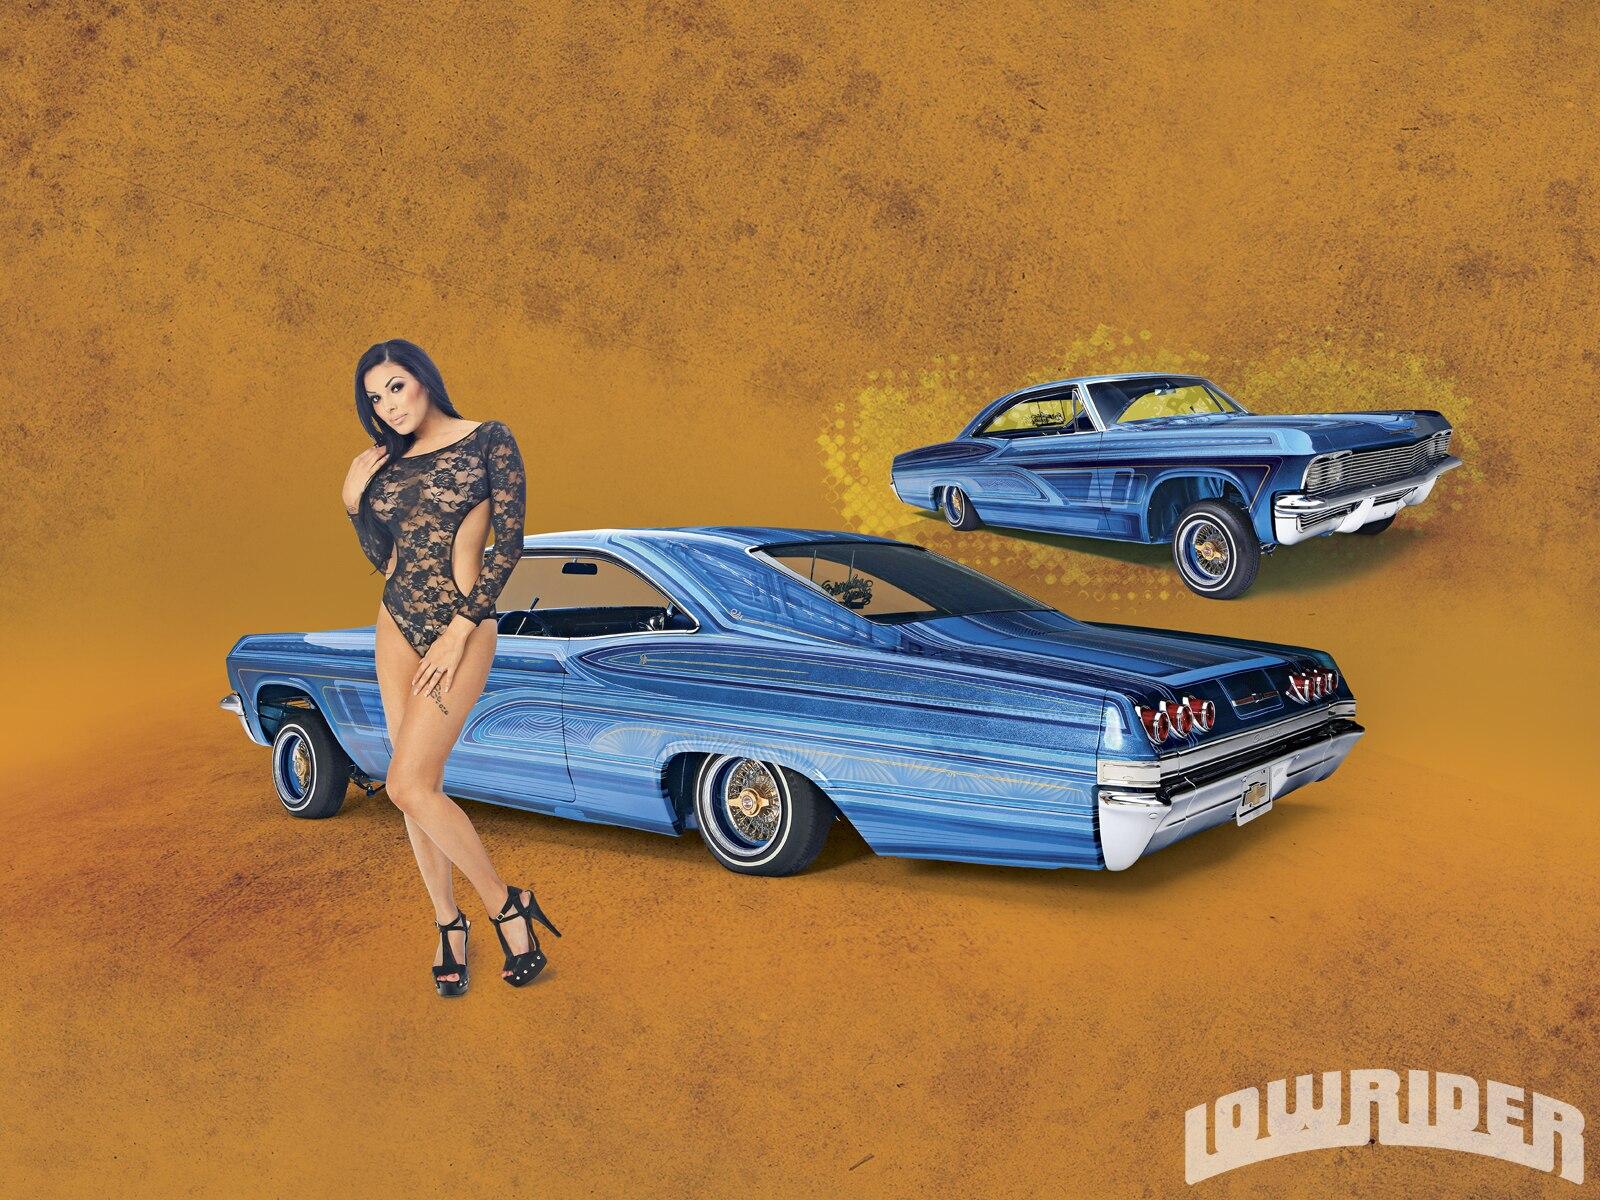 1206-lrmp-01-o-1965-chevrolet-impala-meagan-de-la-torre